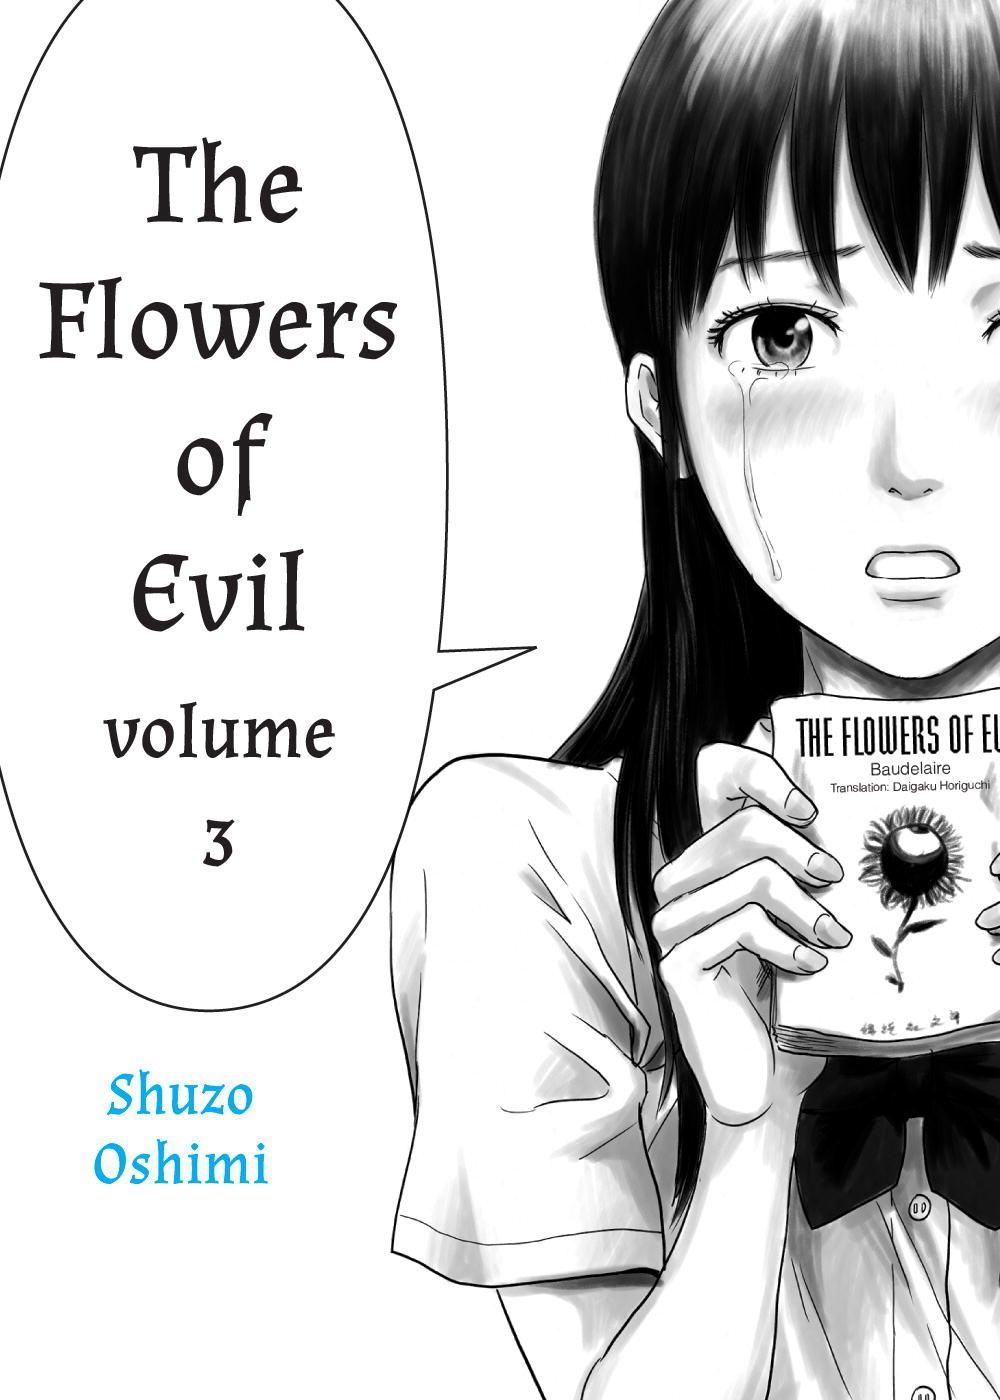 Shuzo Oshimi's manga The Flowers of Evil part 3 10.95